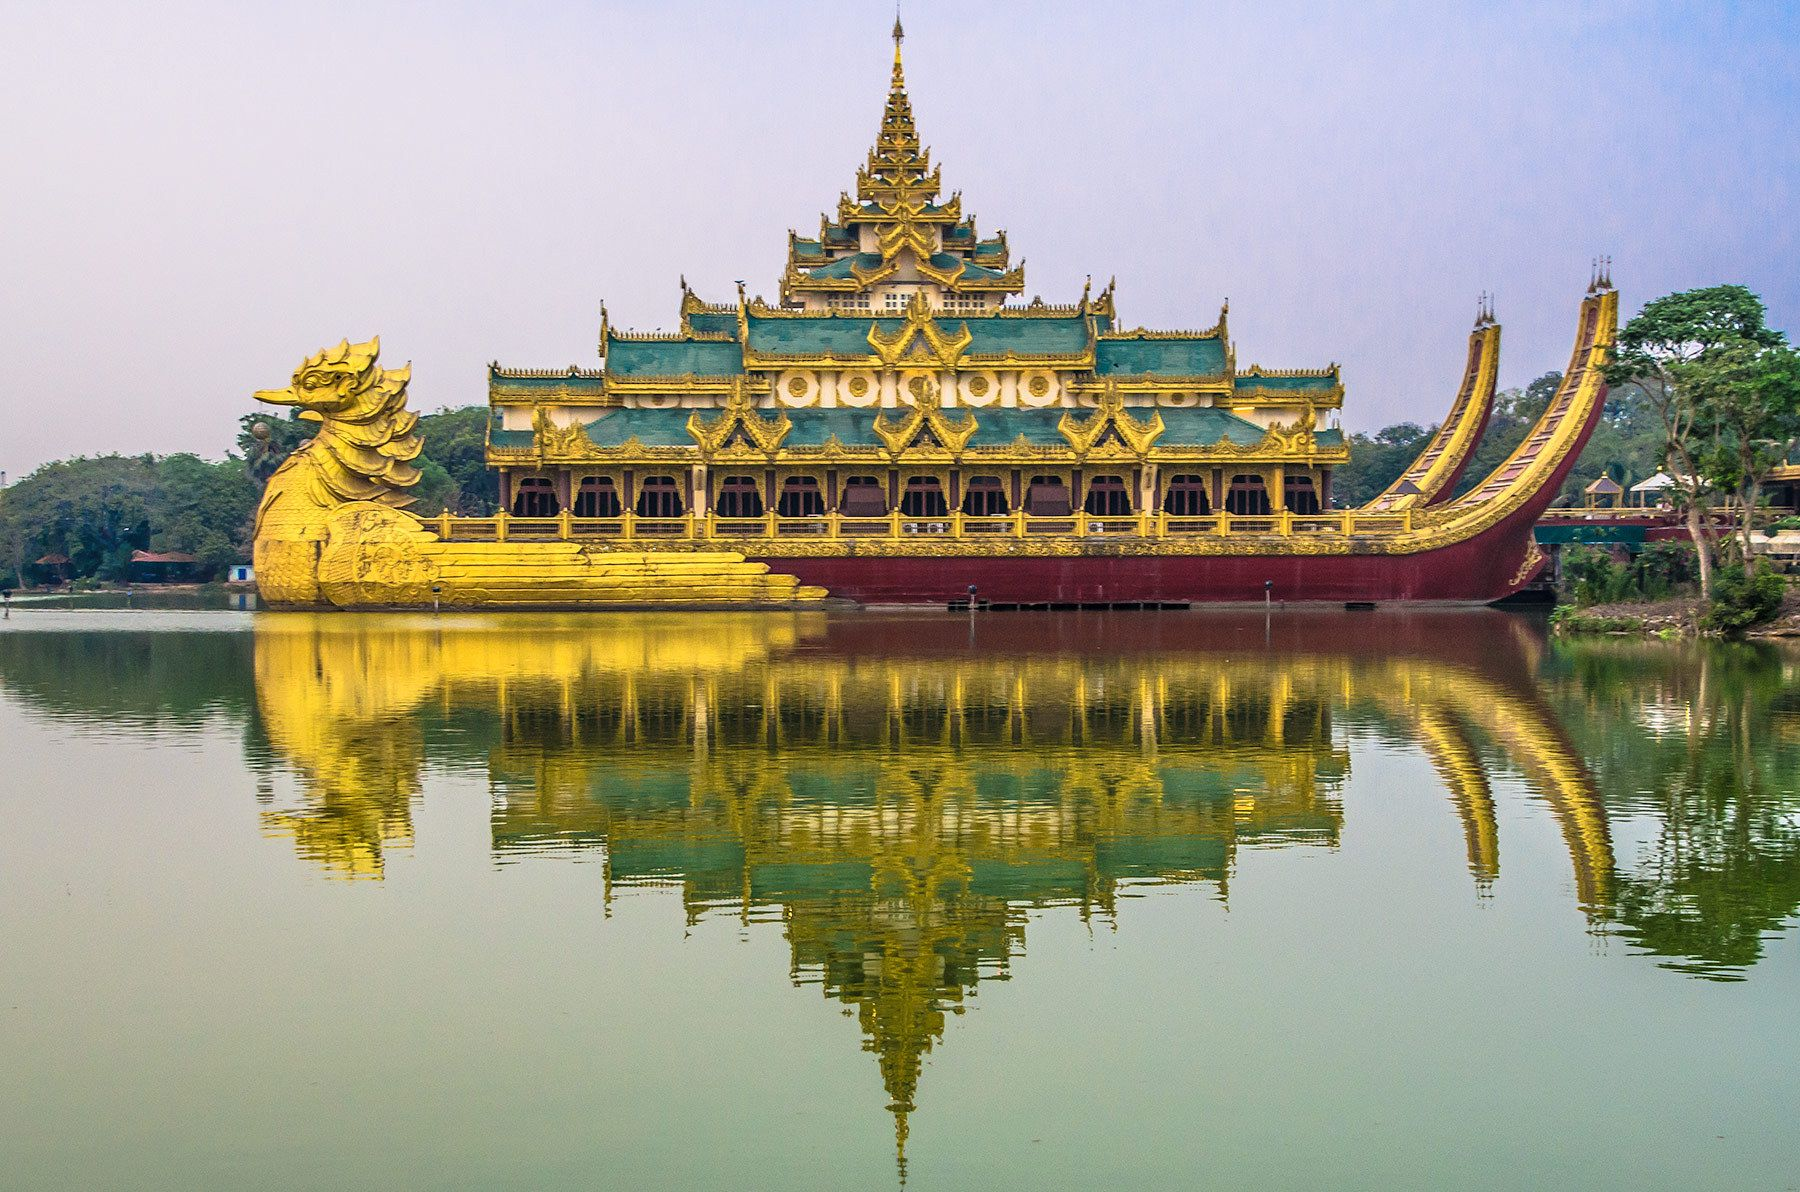 Karaweik Palace, Kandawgyi Lake, Yangon, Myanmar